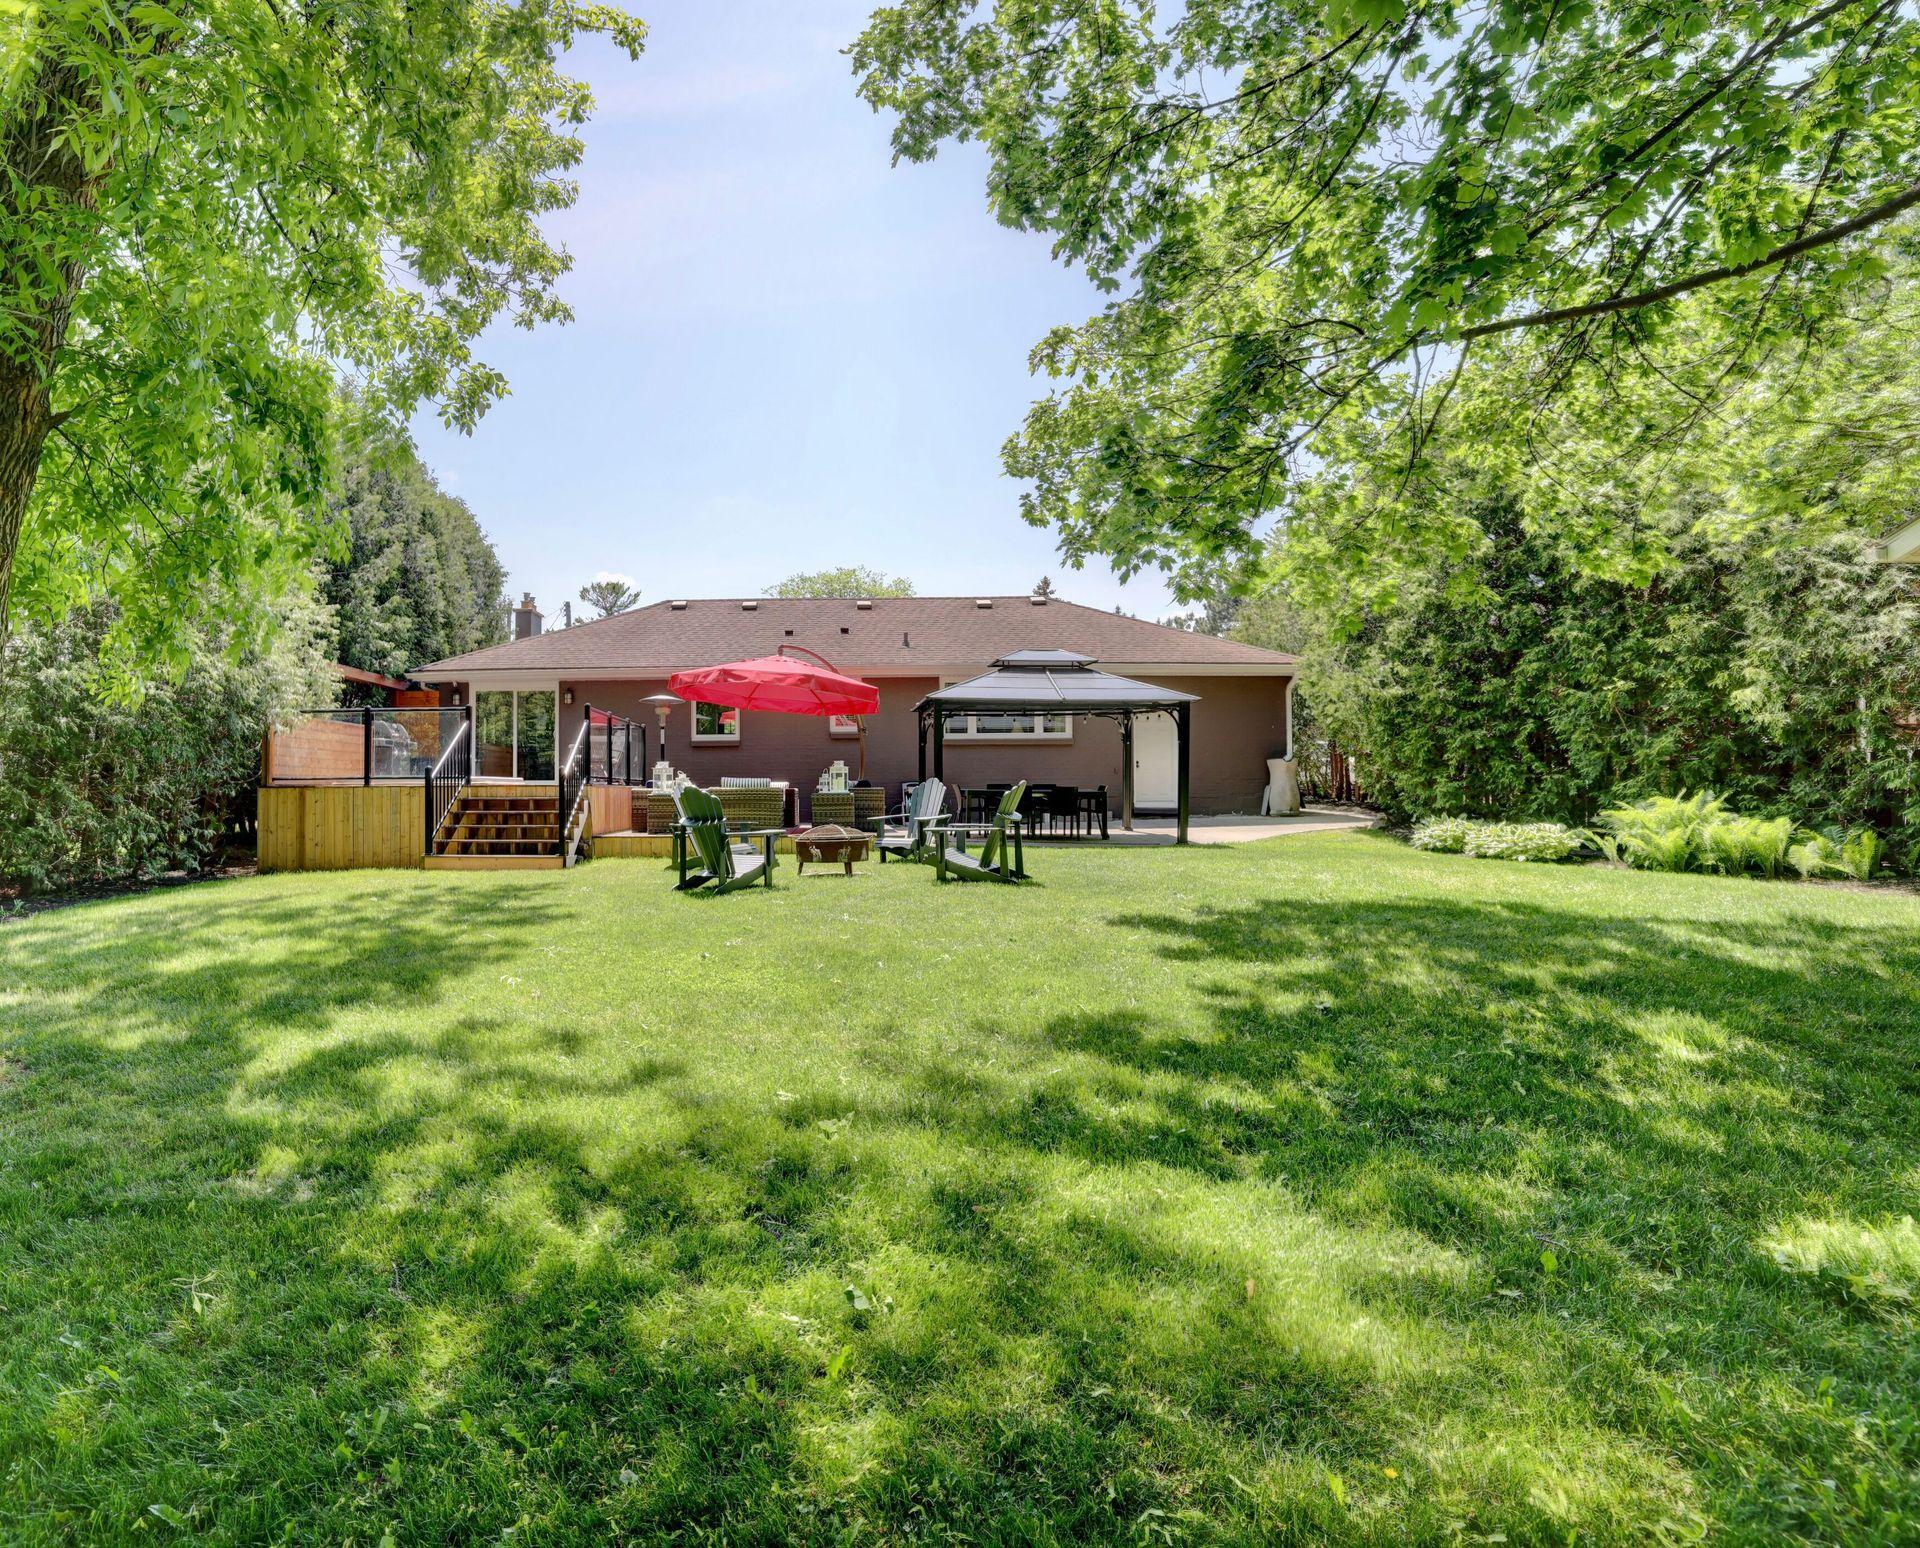 249-lakeview-ave-burlington-large-back-yard at 249 Lakeview Ave, Burlington,